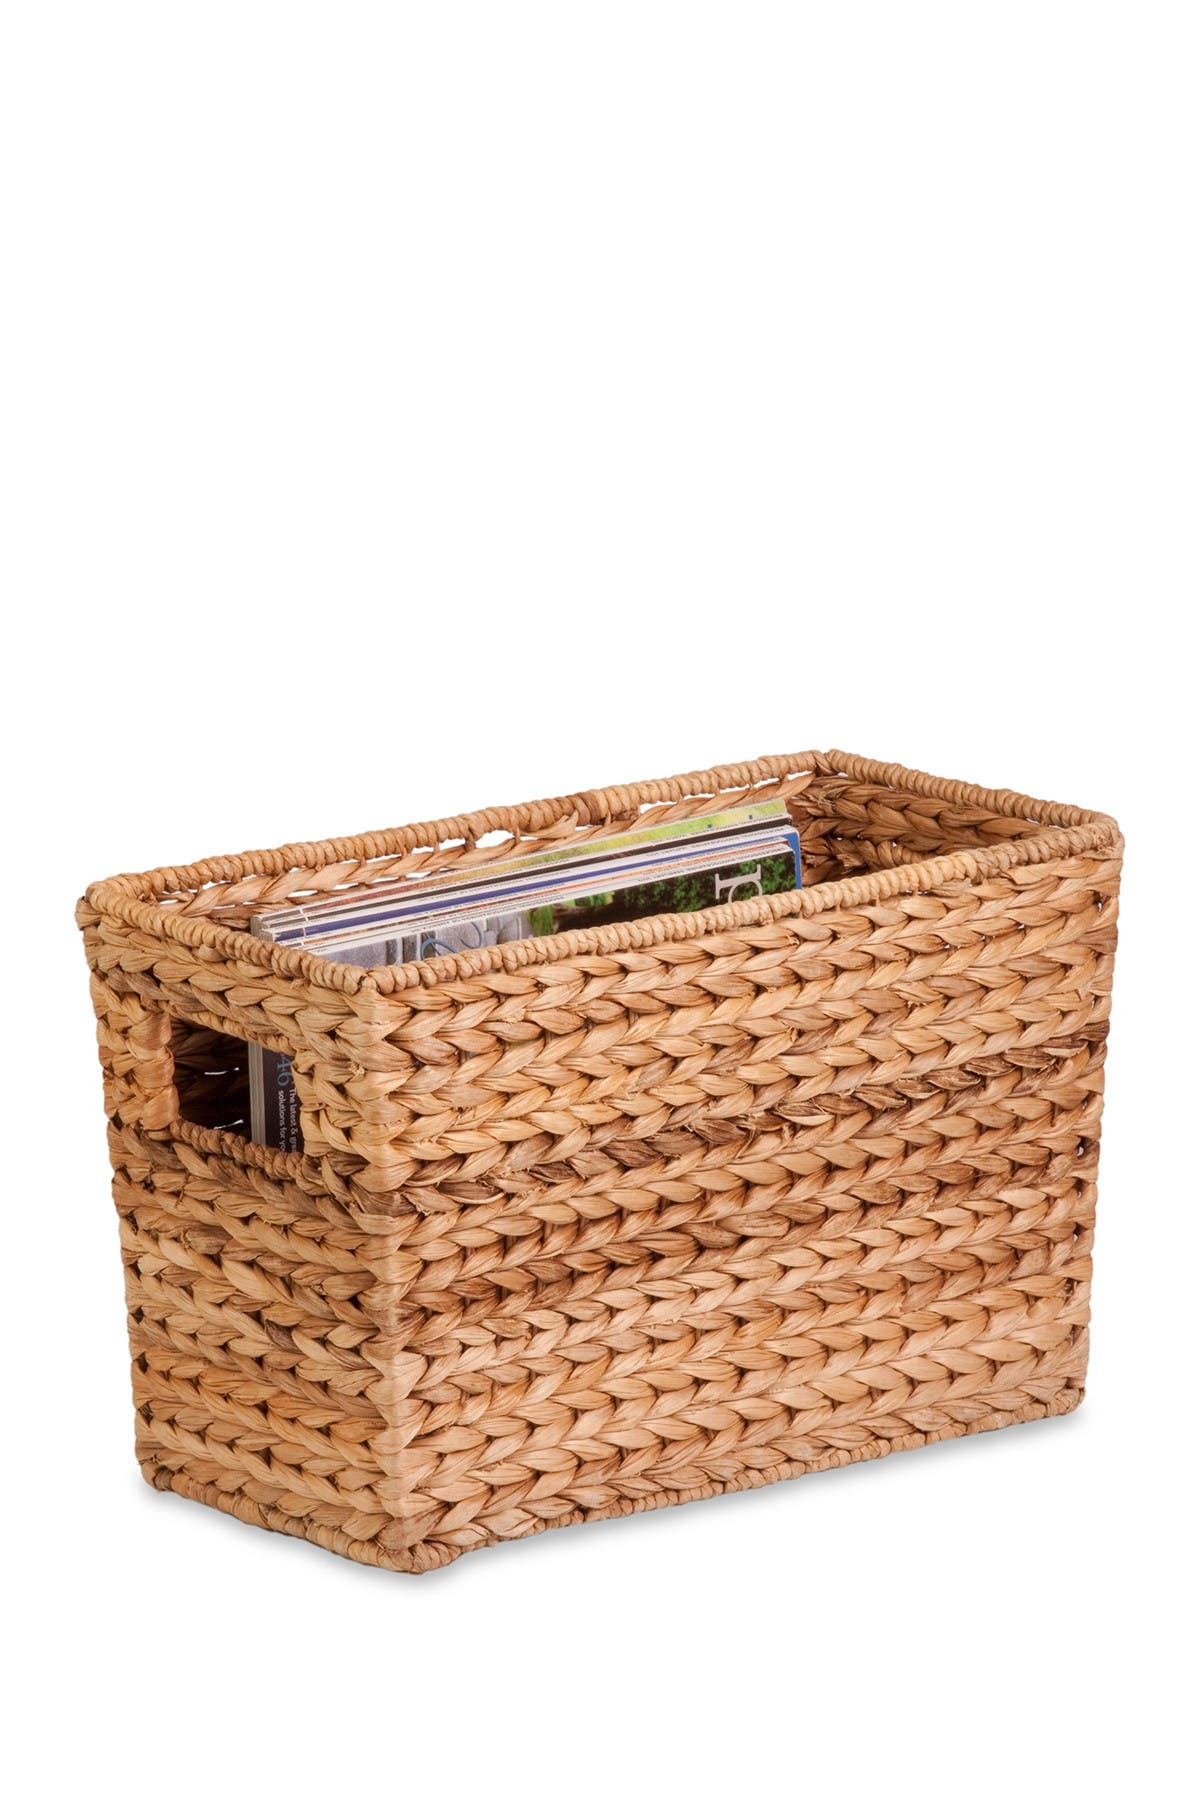 Image of Honey-Can-Do Water Hyacinth Natural Magazine Basket